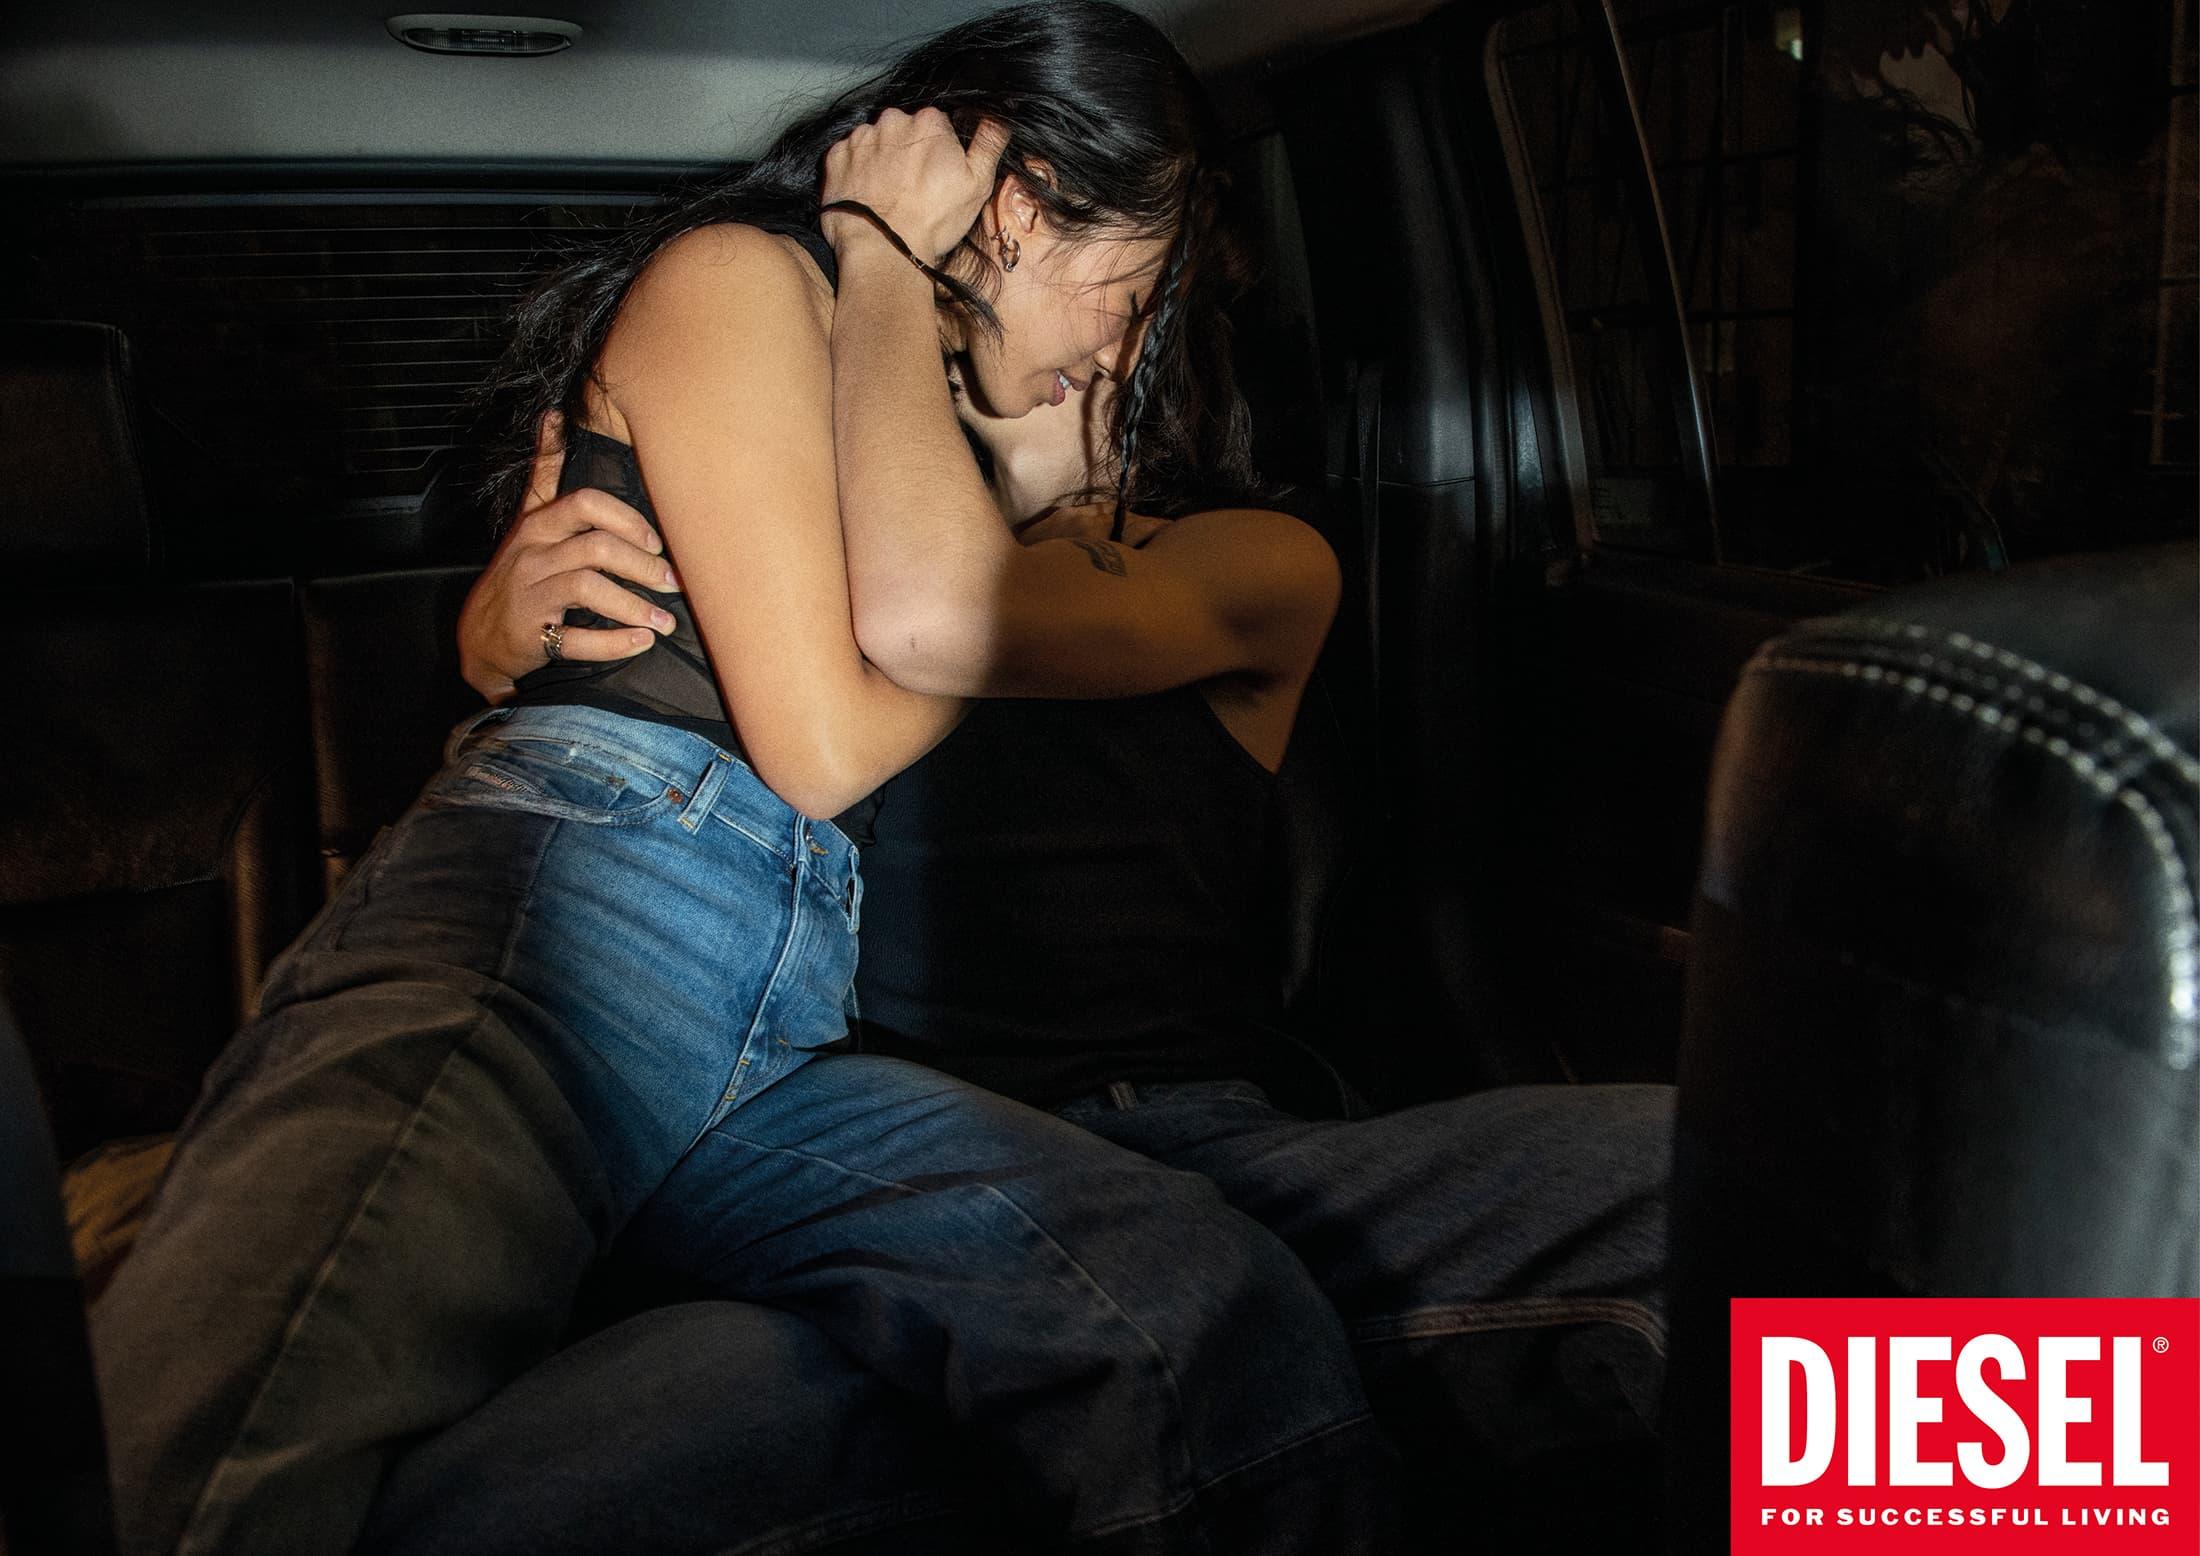 Diesel Spring 2021 Ad Campaign Film & Photos